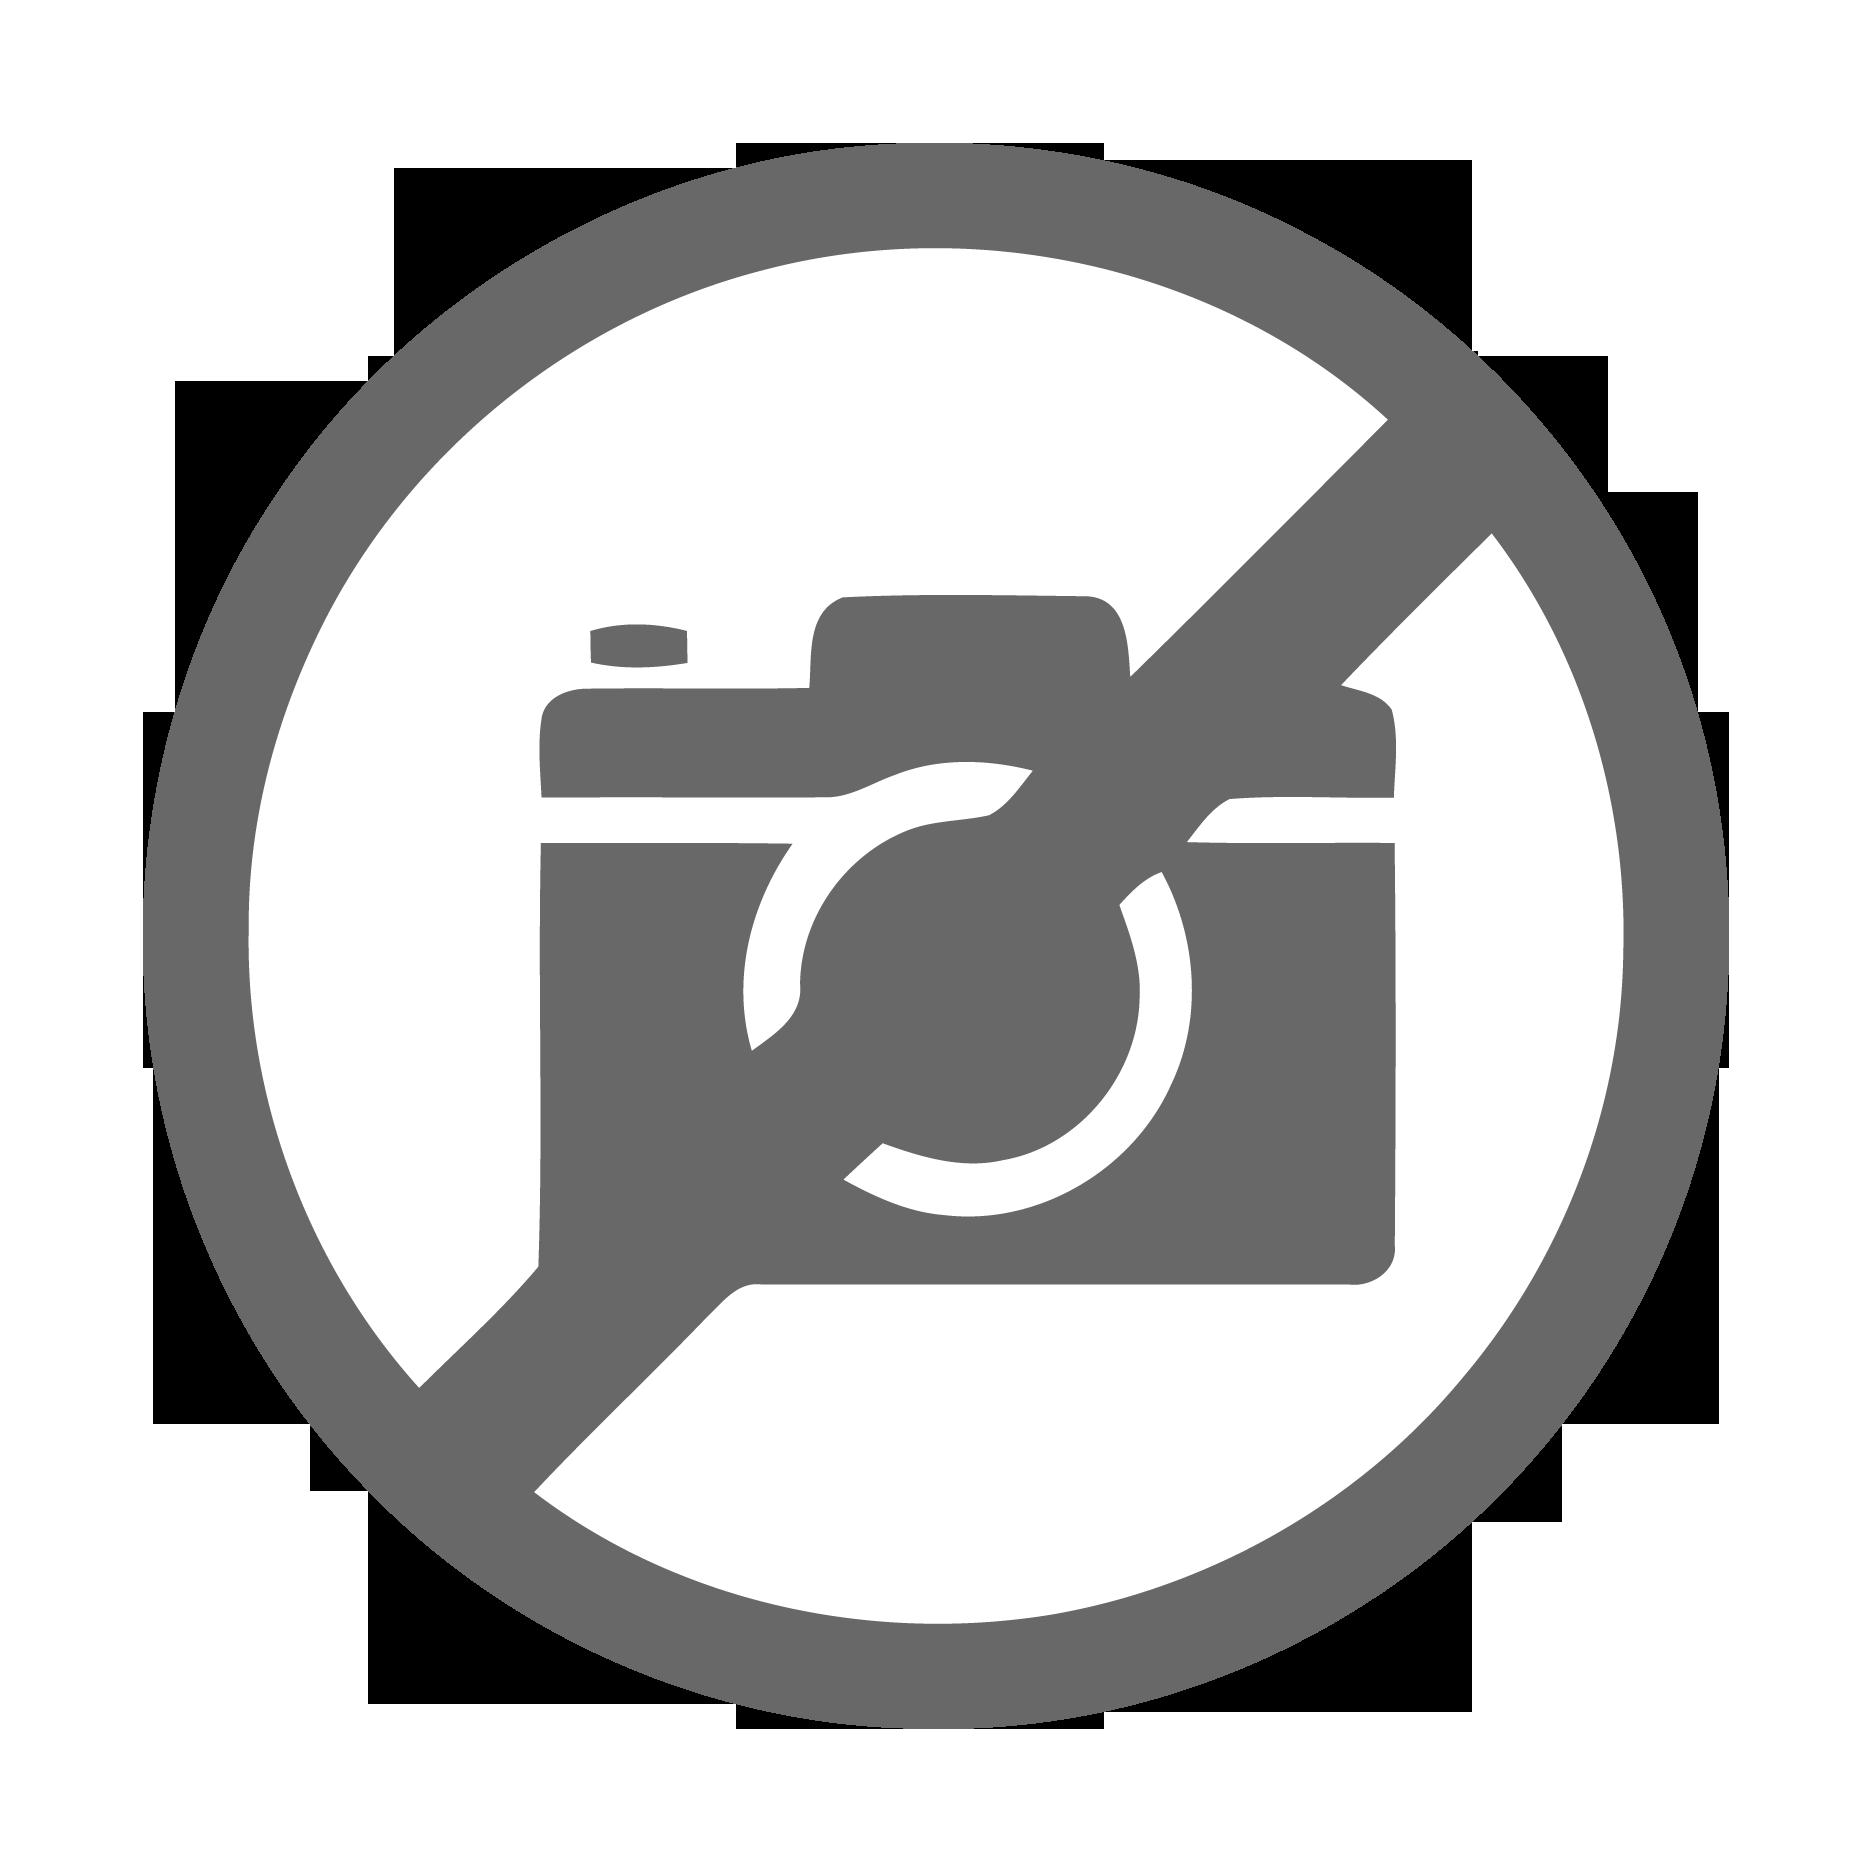 Classic döner & grill